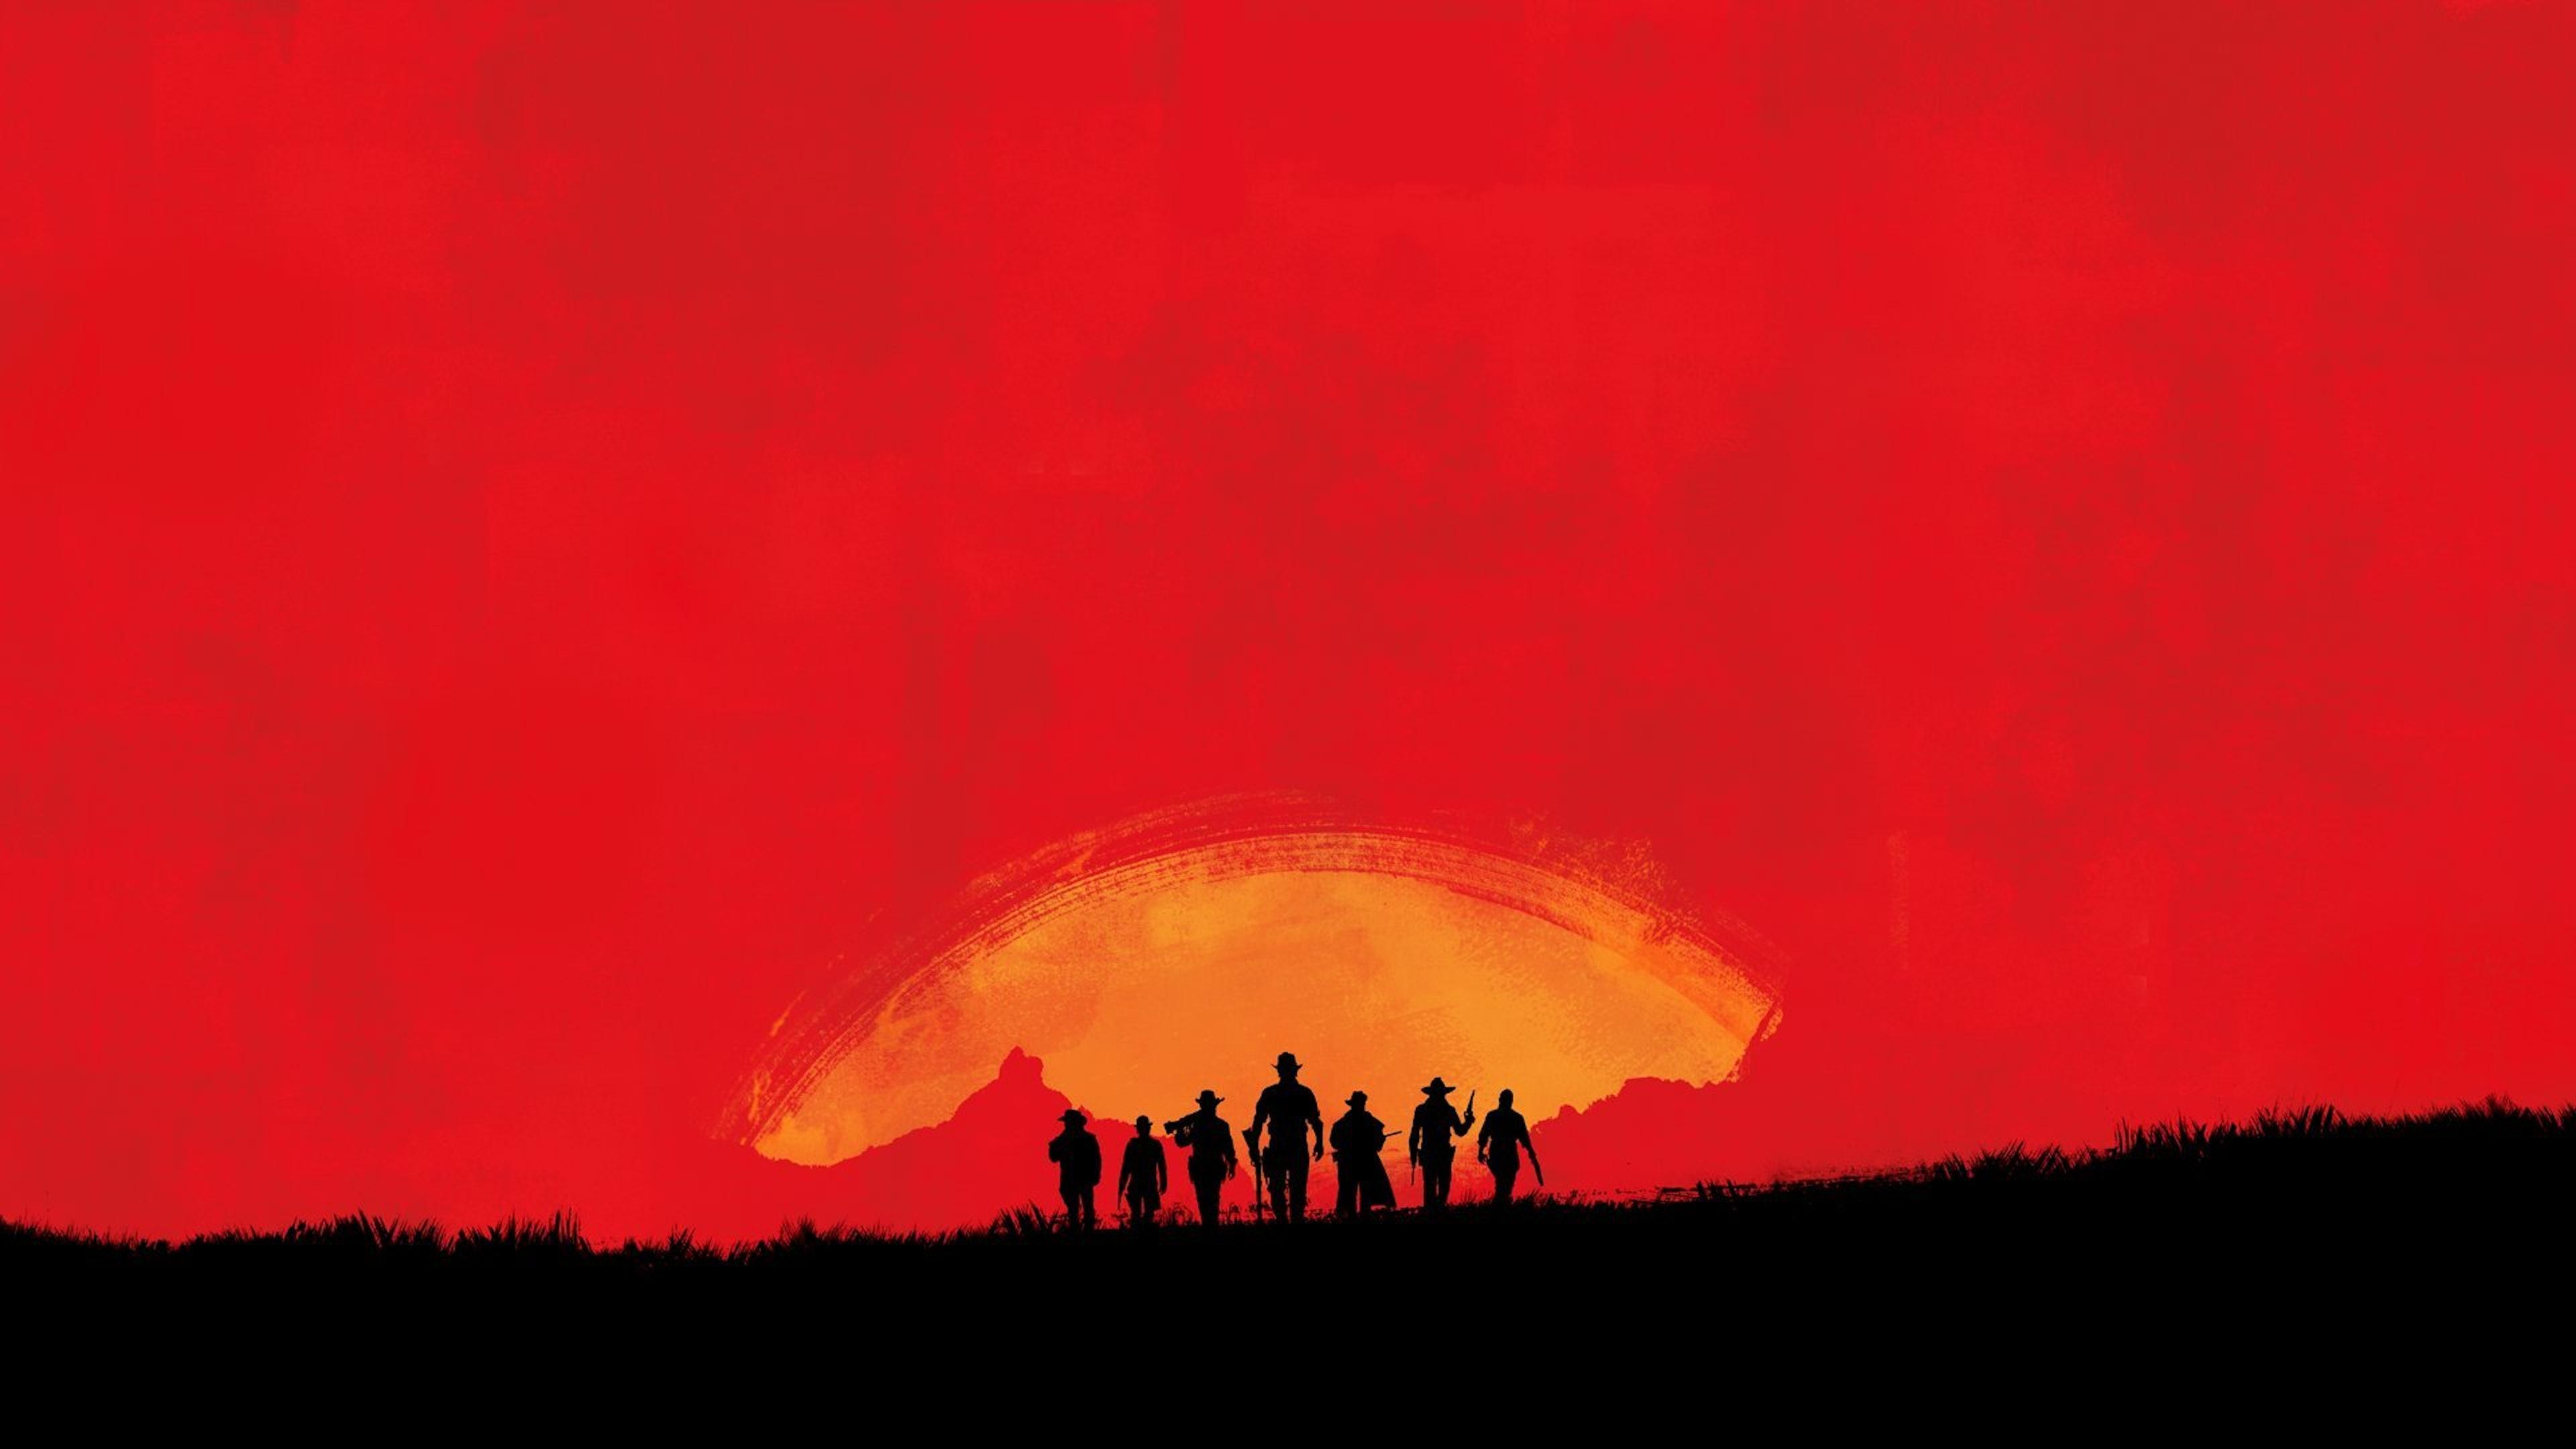 Yeah, Rockstar definitely has some 'Red' news on the horizon.